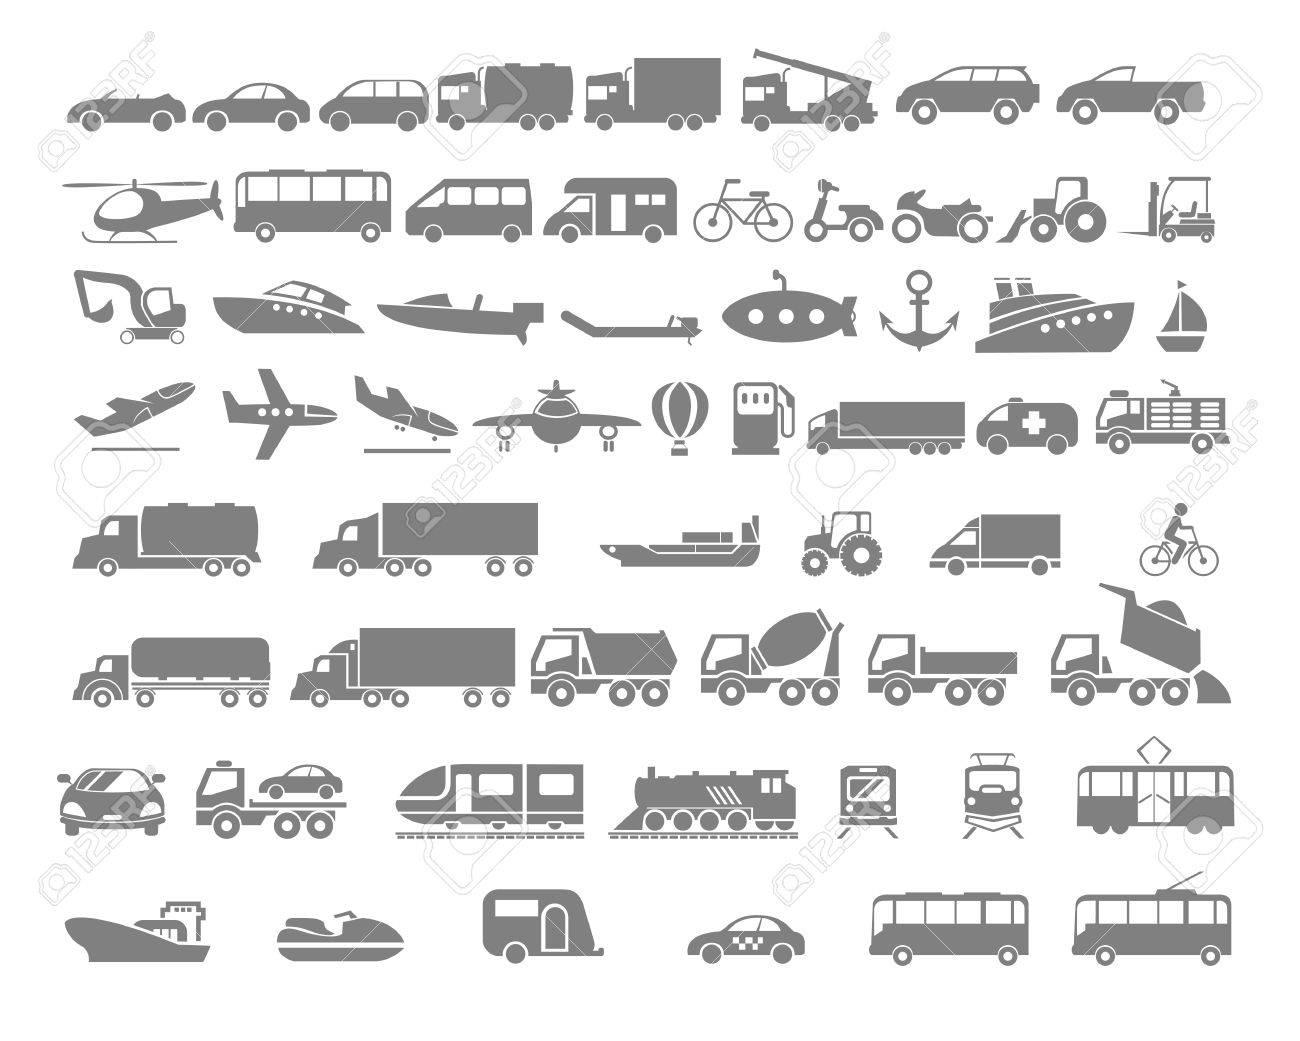 Vehicle and Transportation flat icon set. Vector flat design illustration. - 39178307